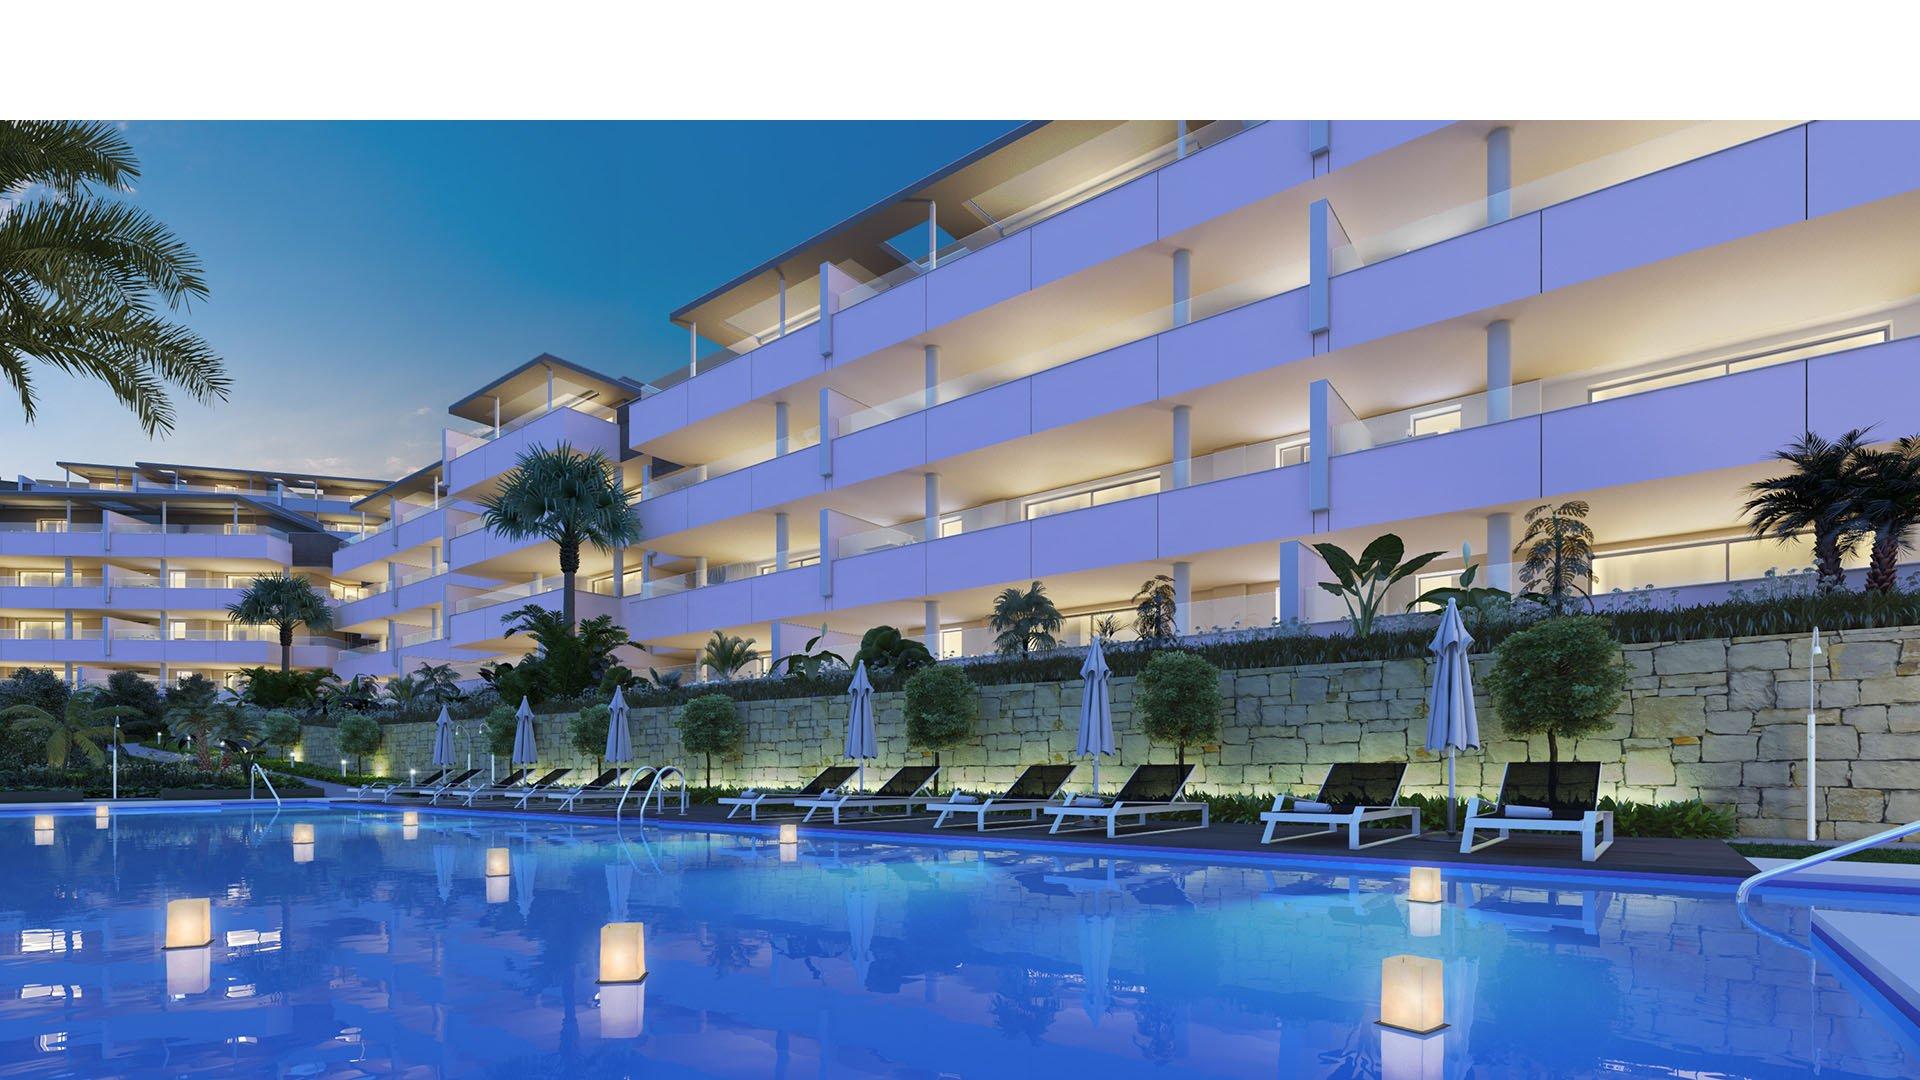 Botanic: Modern apartments in Benahavís at Los Arqueros Golf